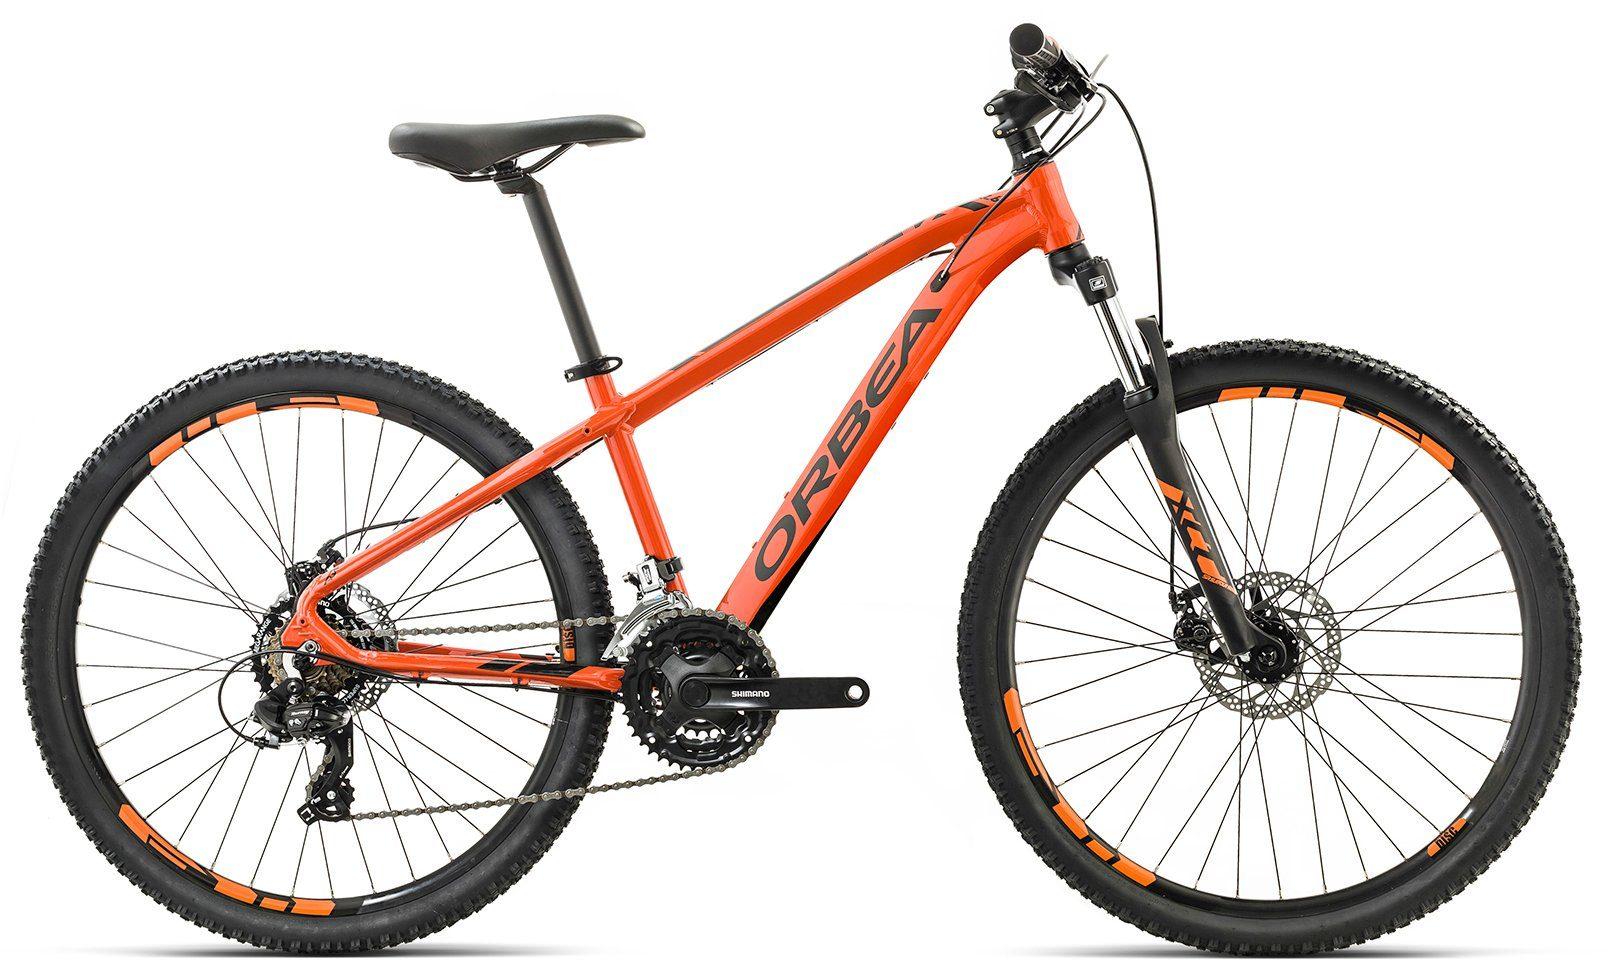 ORBEA Hardtail Mountainbike, 26 Zoll, 21 Gang Shimano TY300 Kettenschaltung, »MX 26 Dirt«